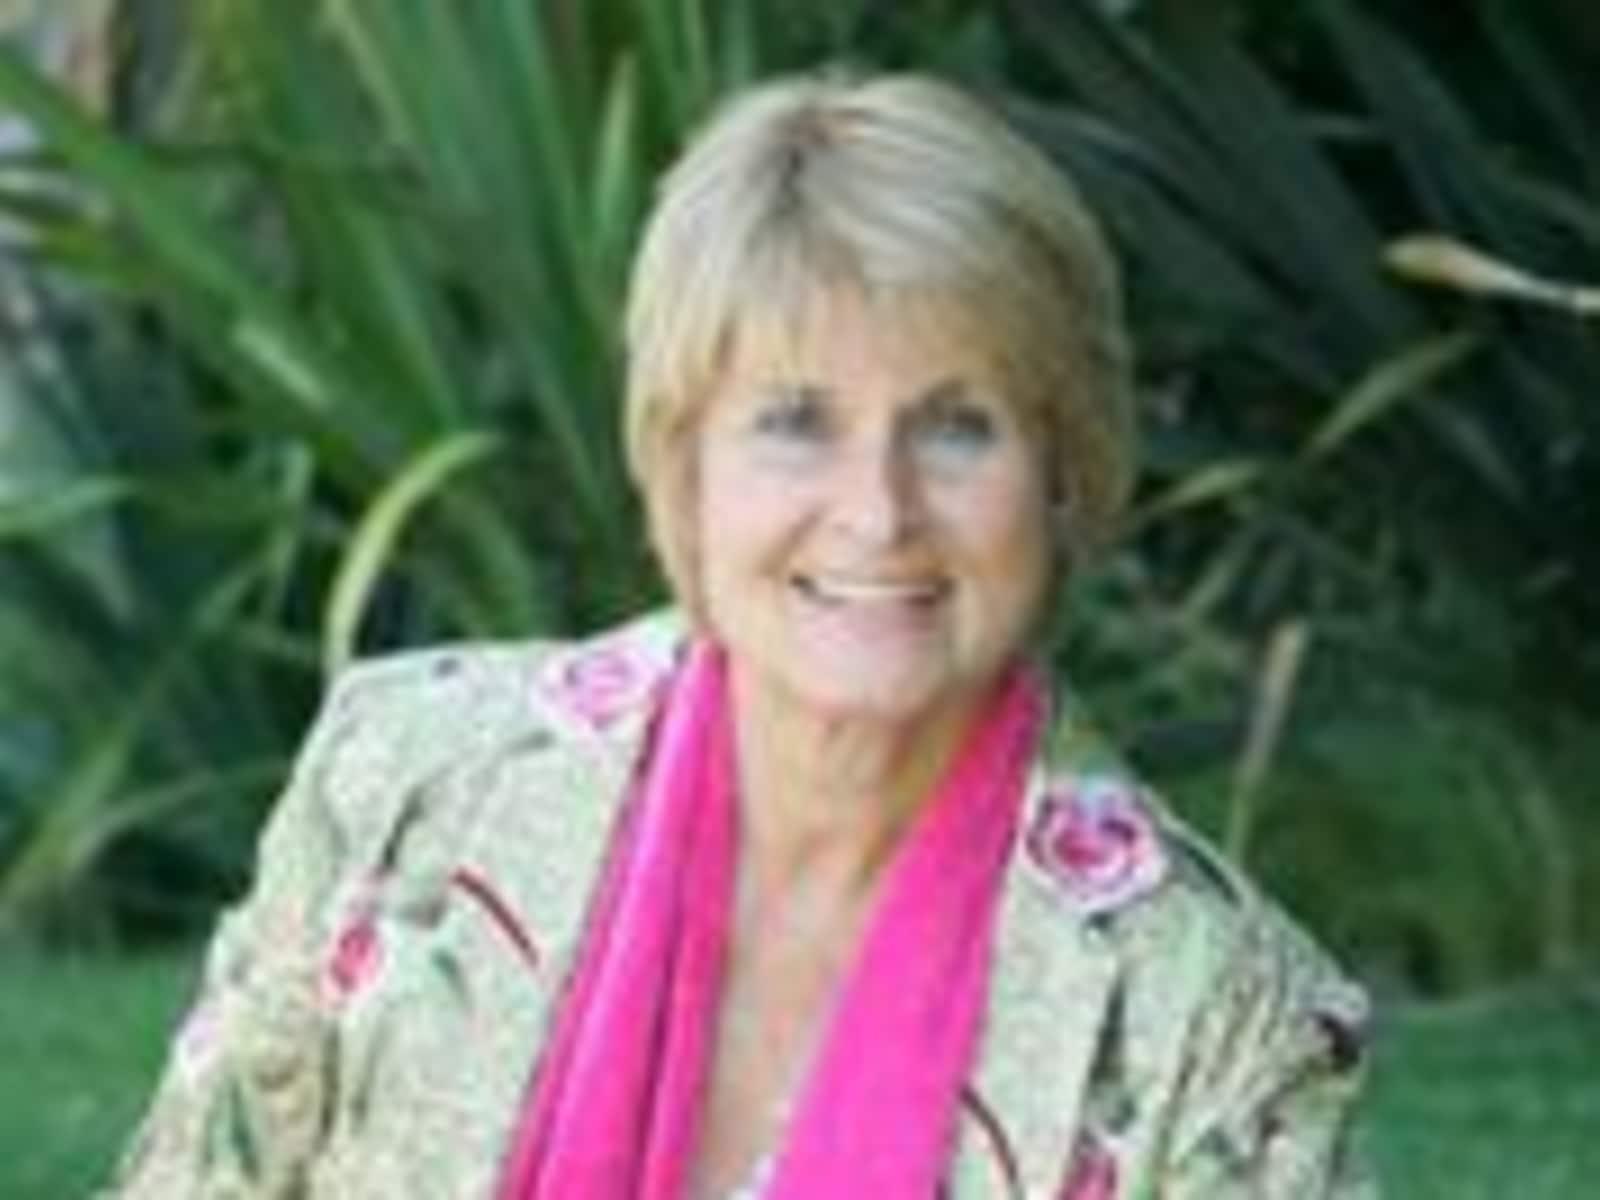 Cheryl anne from Twentynine Palms, California, United States